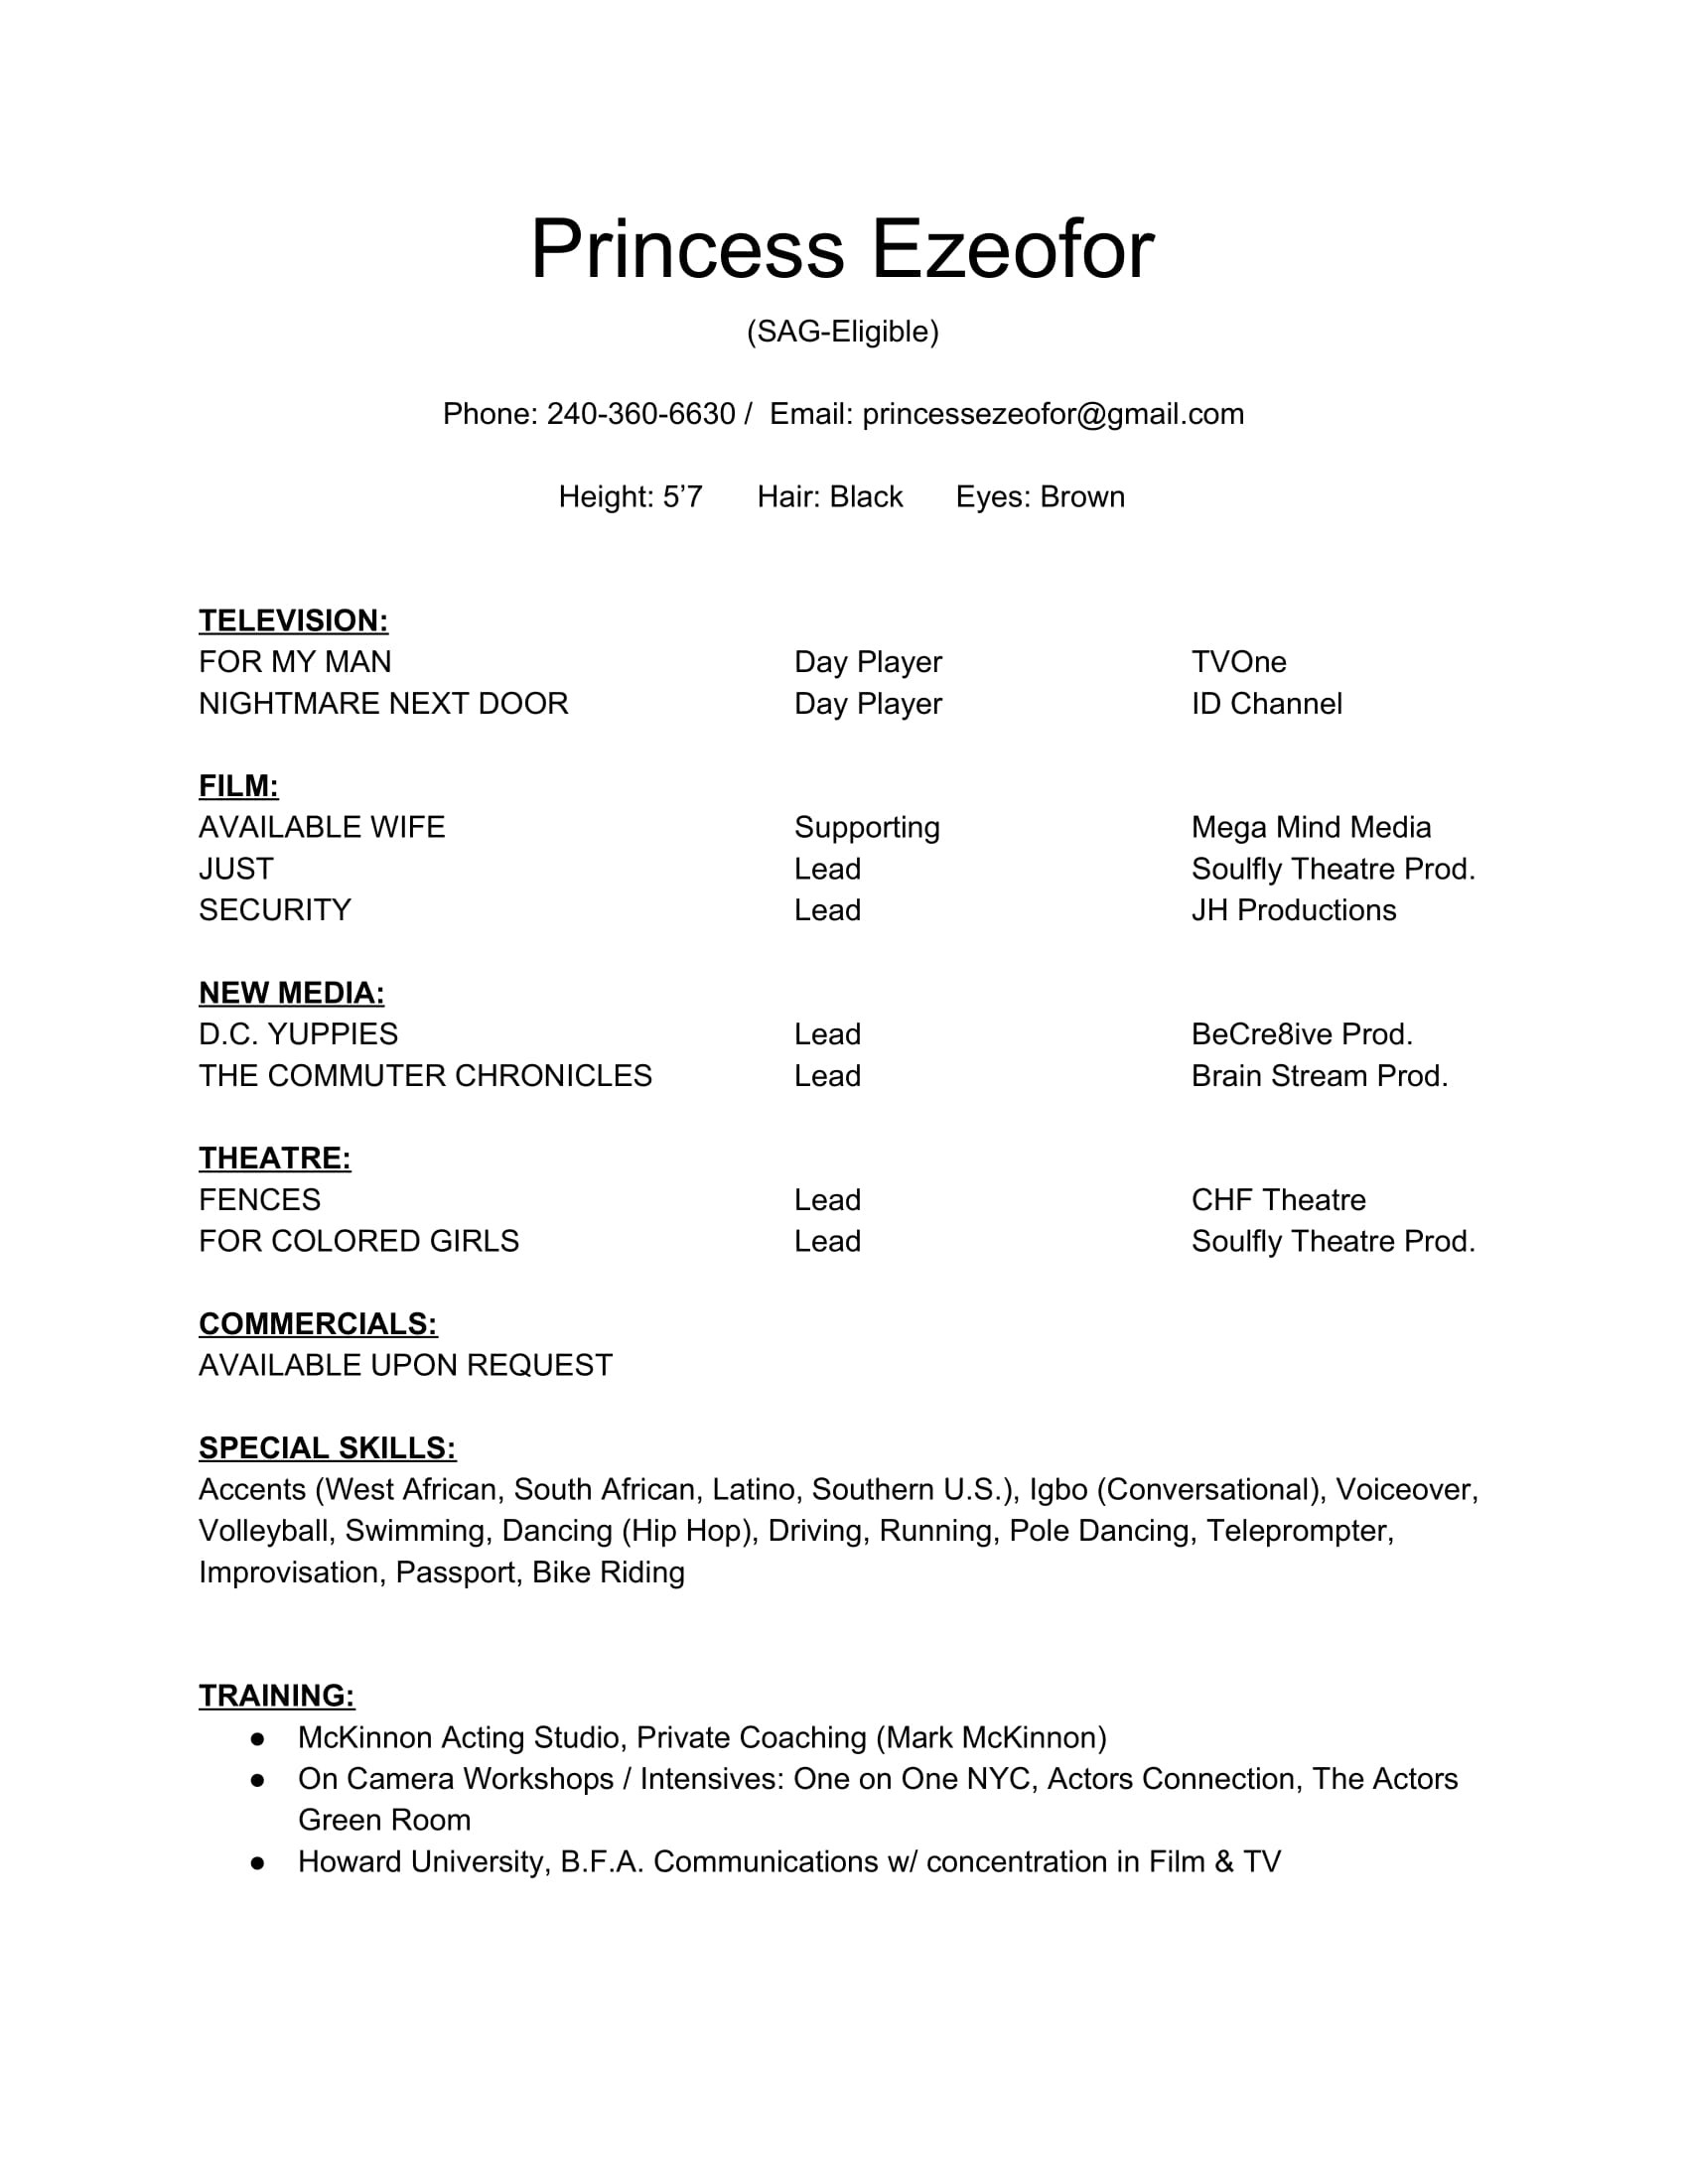 Princess Ezeofor Resume_May 2019b-1.jpg